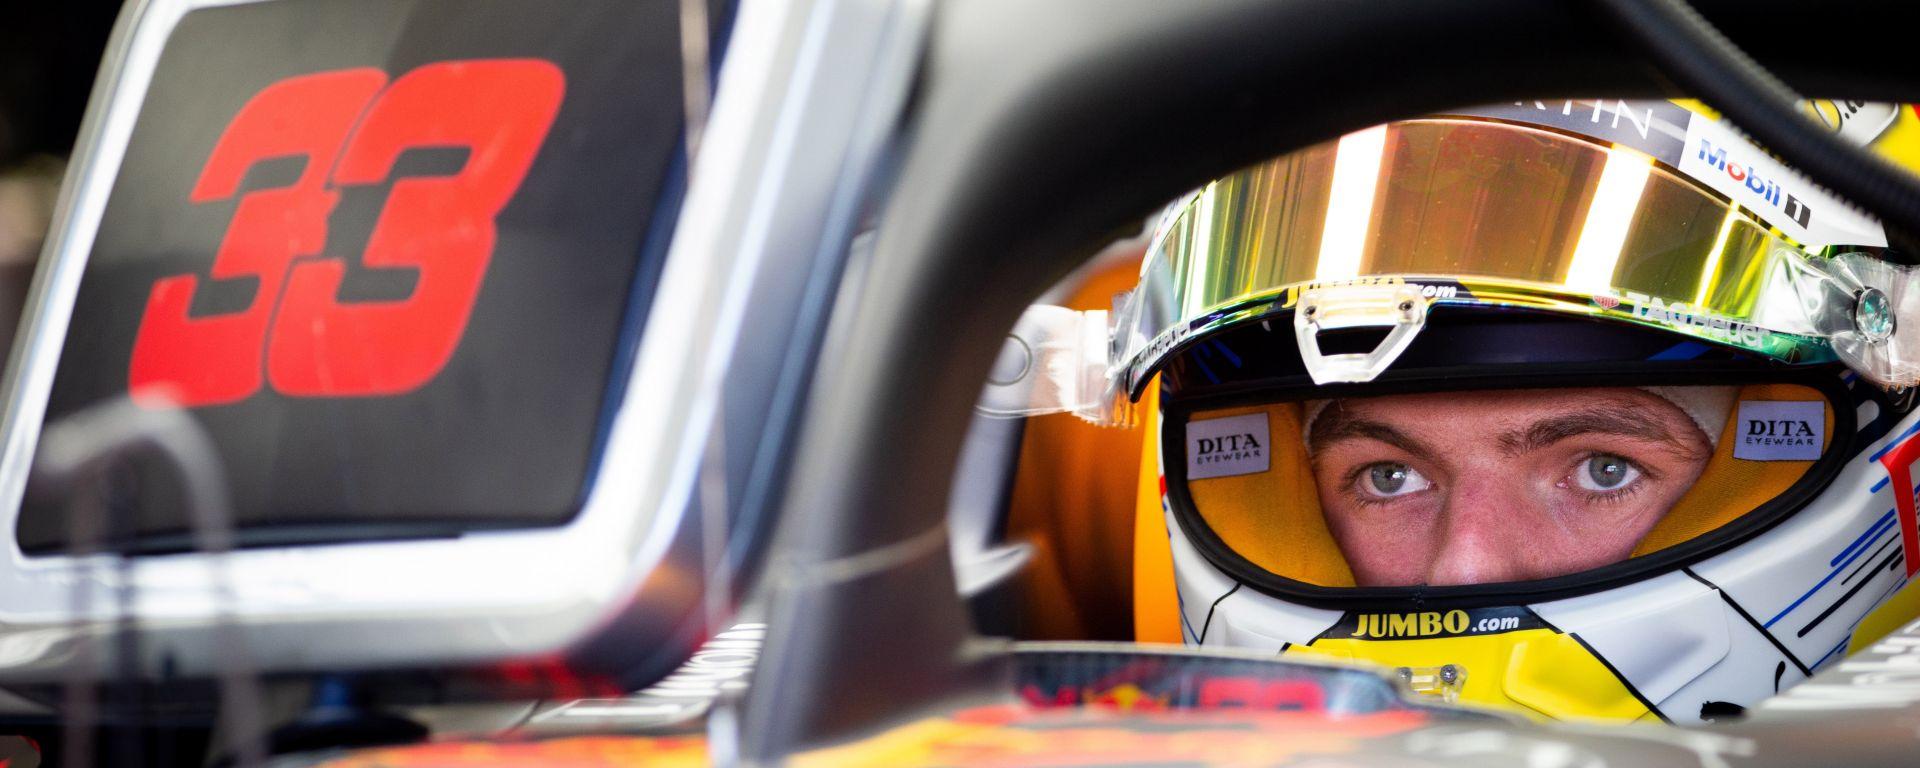 "F1 GP Austria 2019, Verstappen: ""La macchina funziona bene"""